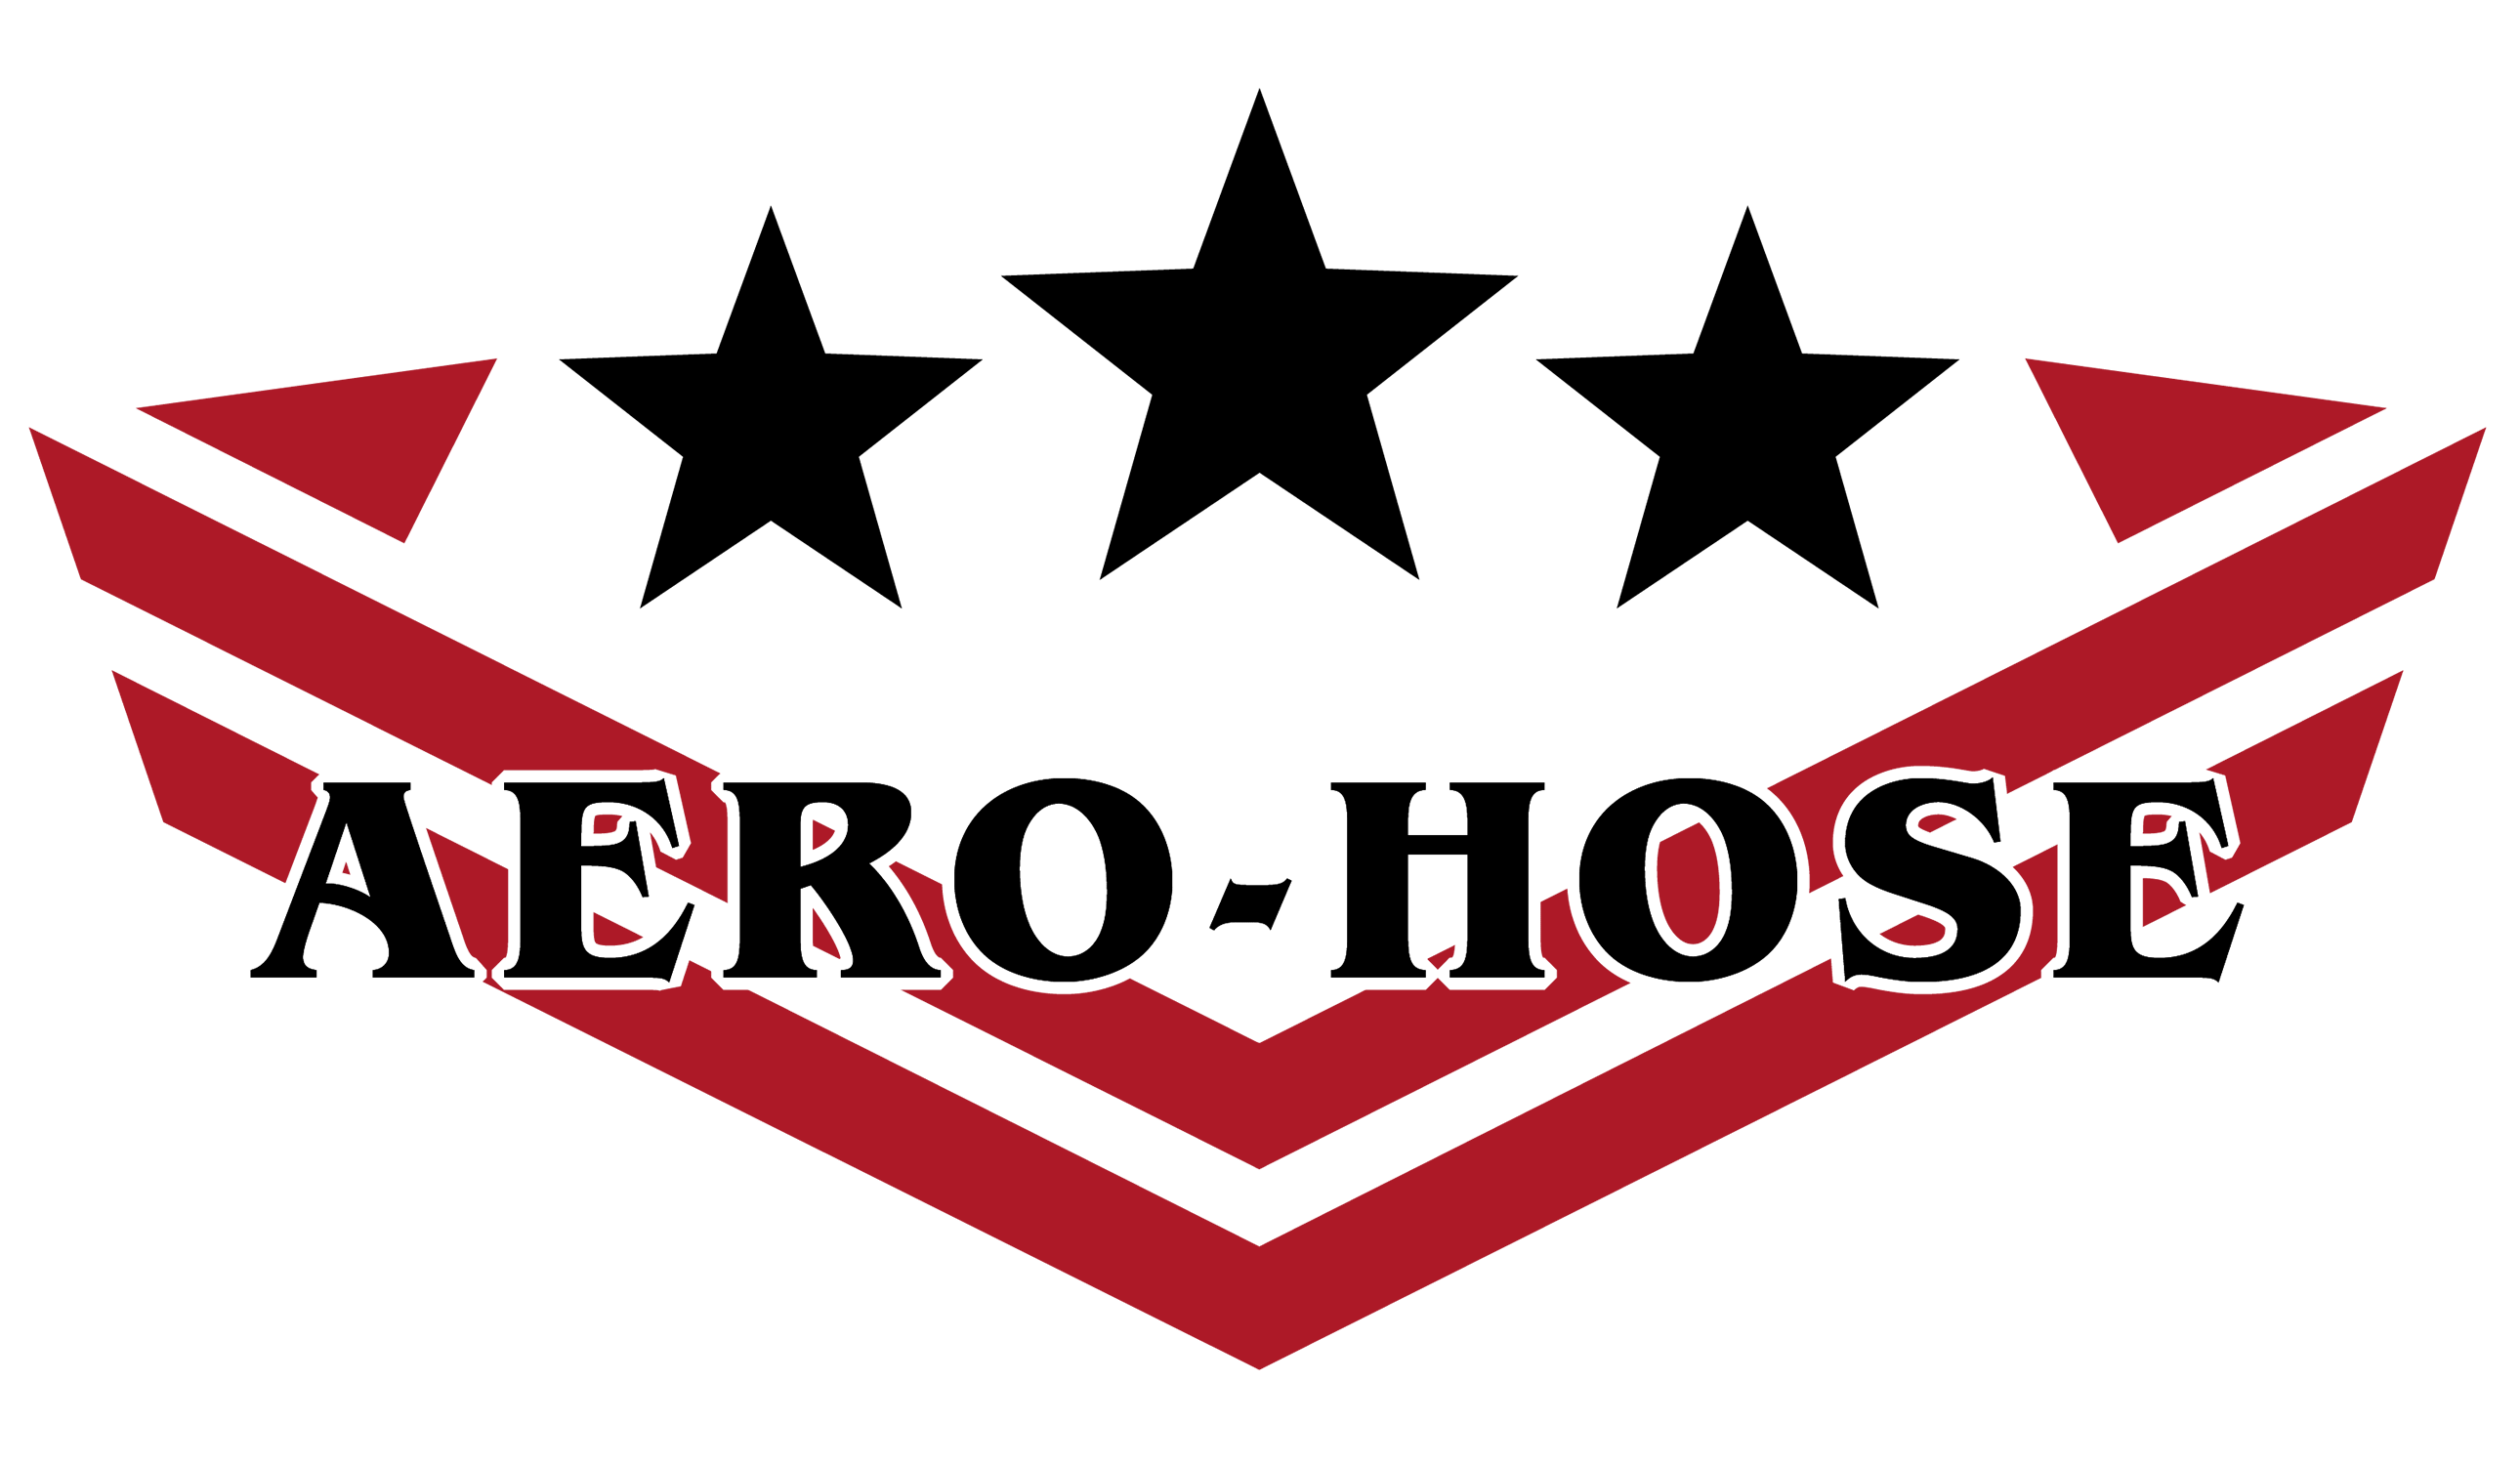 Aero-hose-logo-full-color